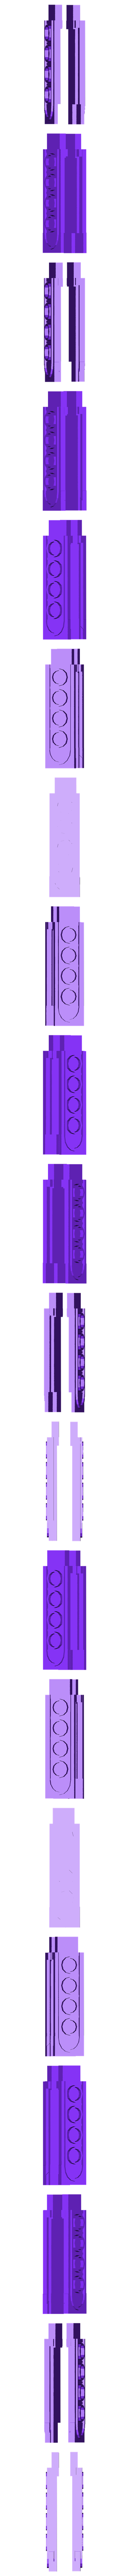 mk_d-4lt_pc_plates.stl Download free STL file Big Plasma Cannon Turret • 3D printing design, JtStrait72